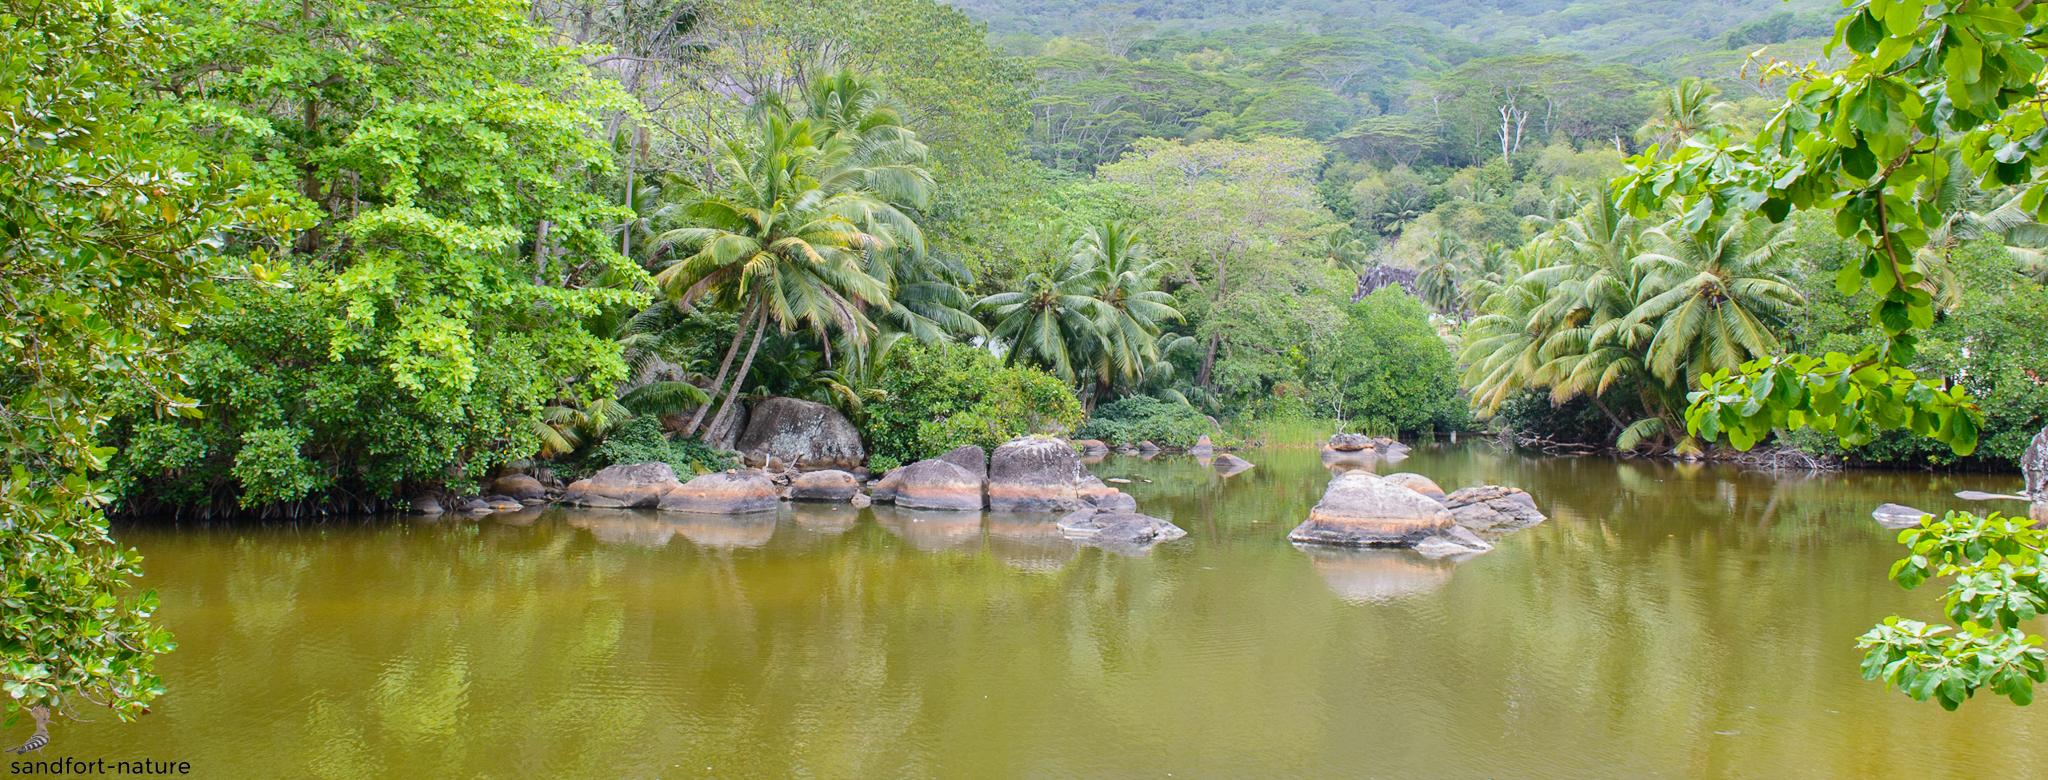 Seychelles-7442-2.jpg